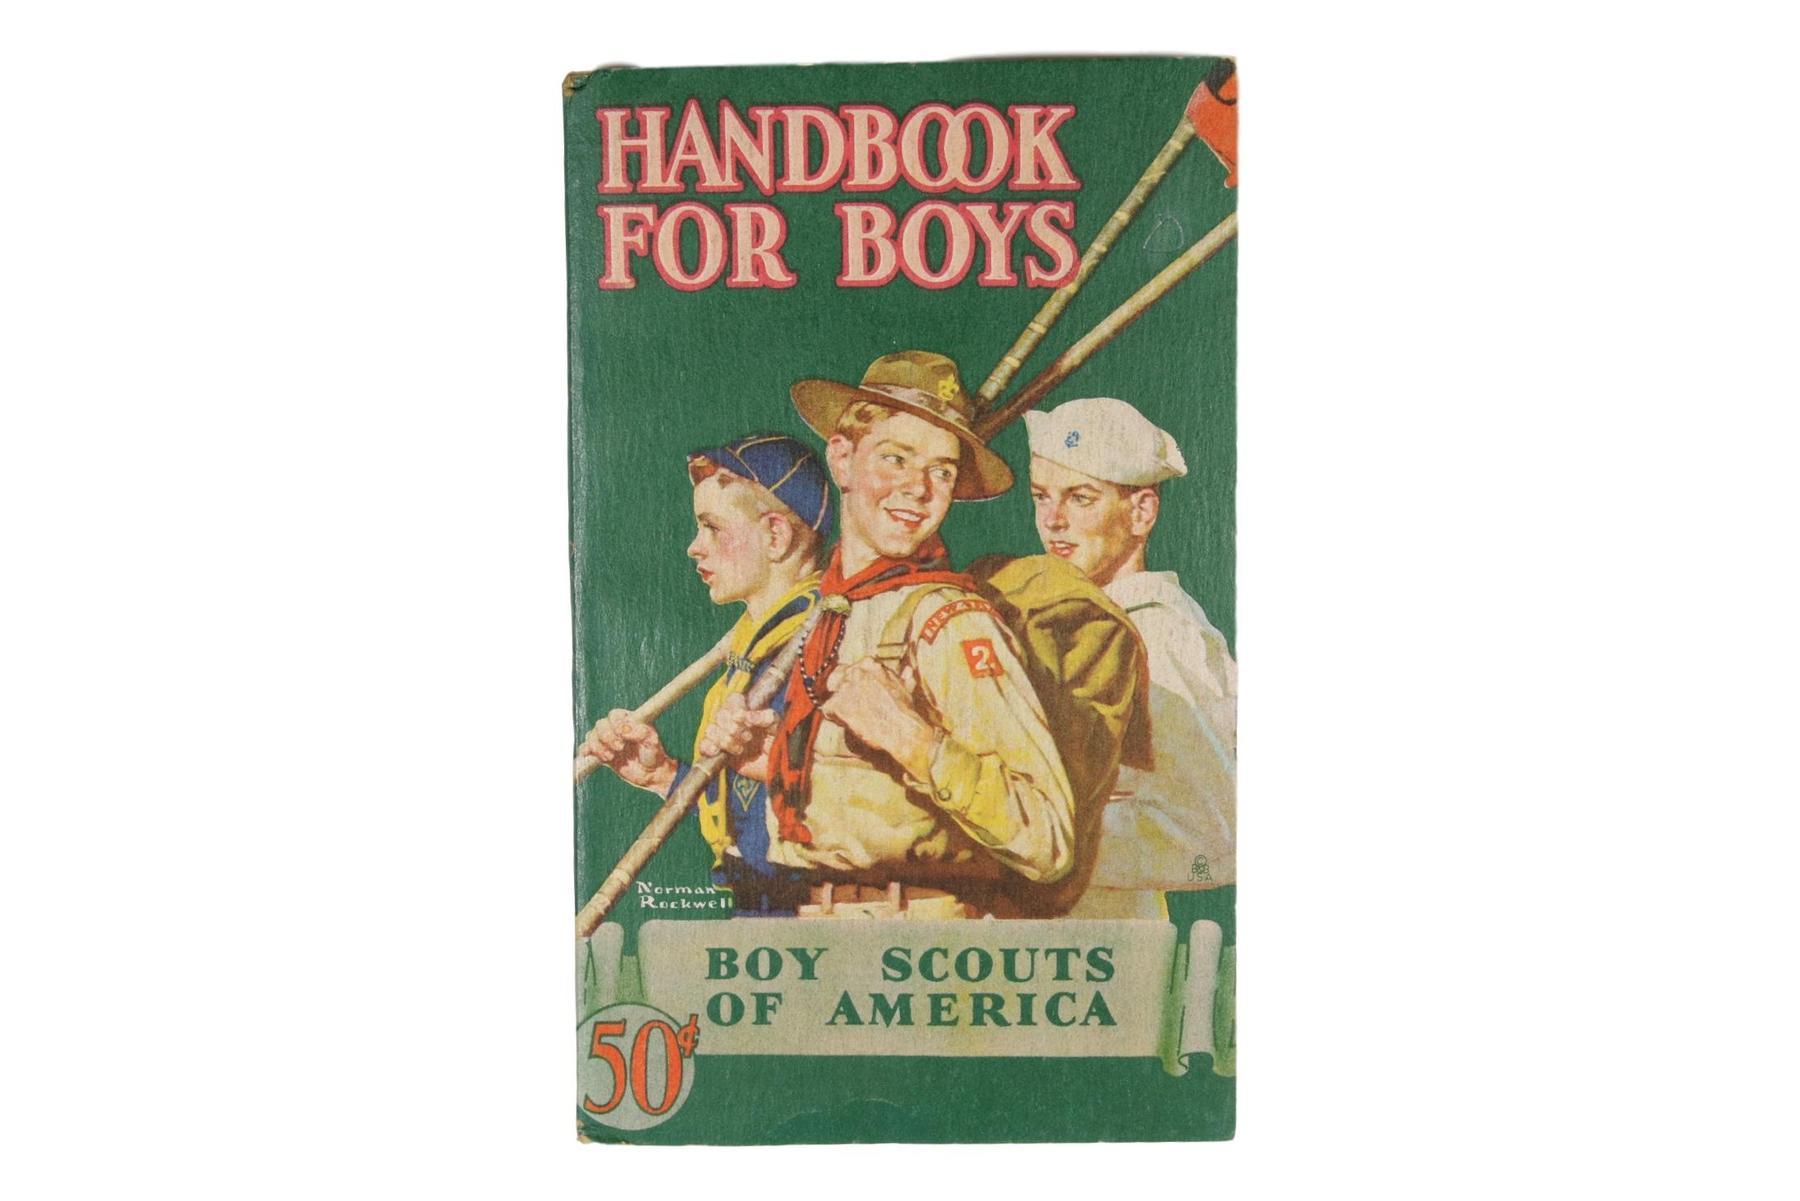 1946 Handbook for Boys